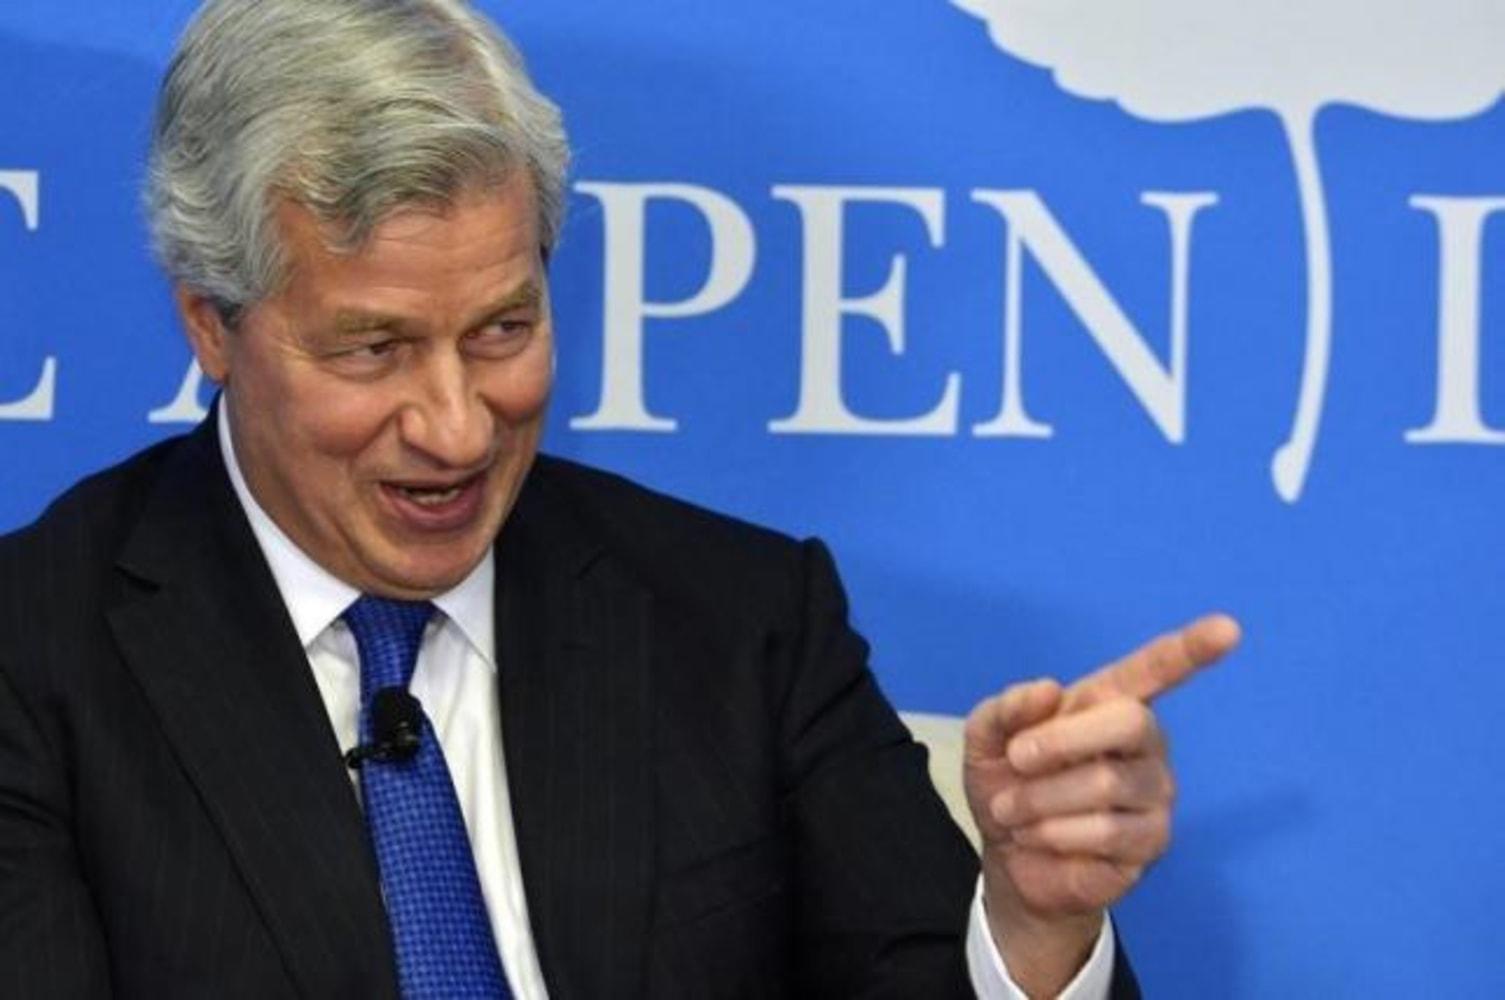 JPMorgan Chase CEO says bank it will raise minimum pay